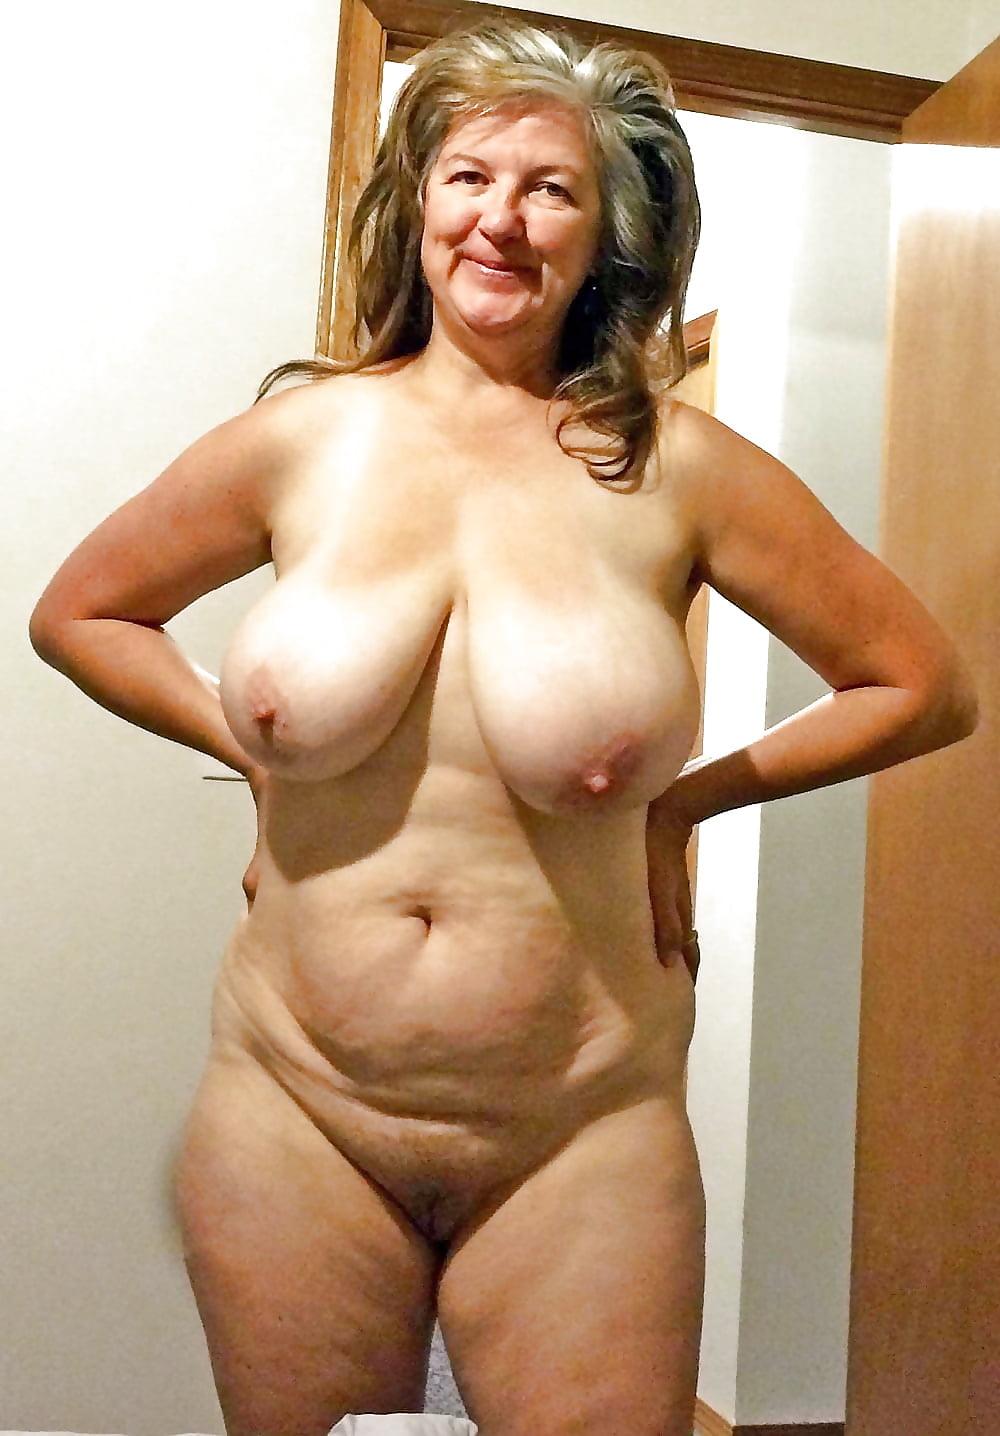 ugly-old-naked-ladies